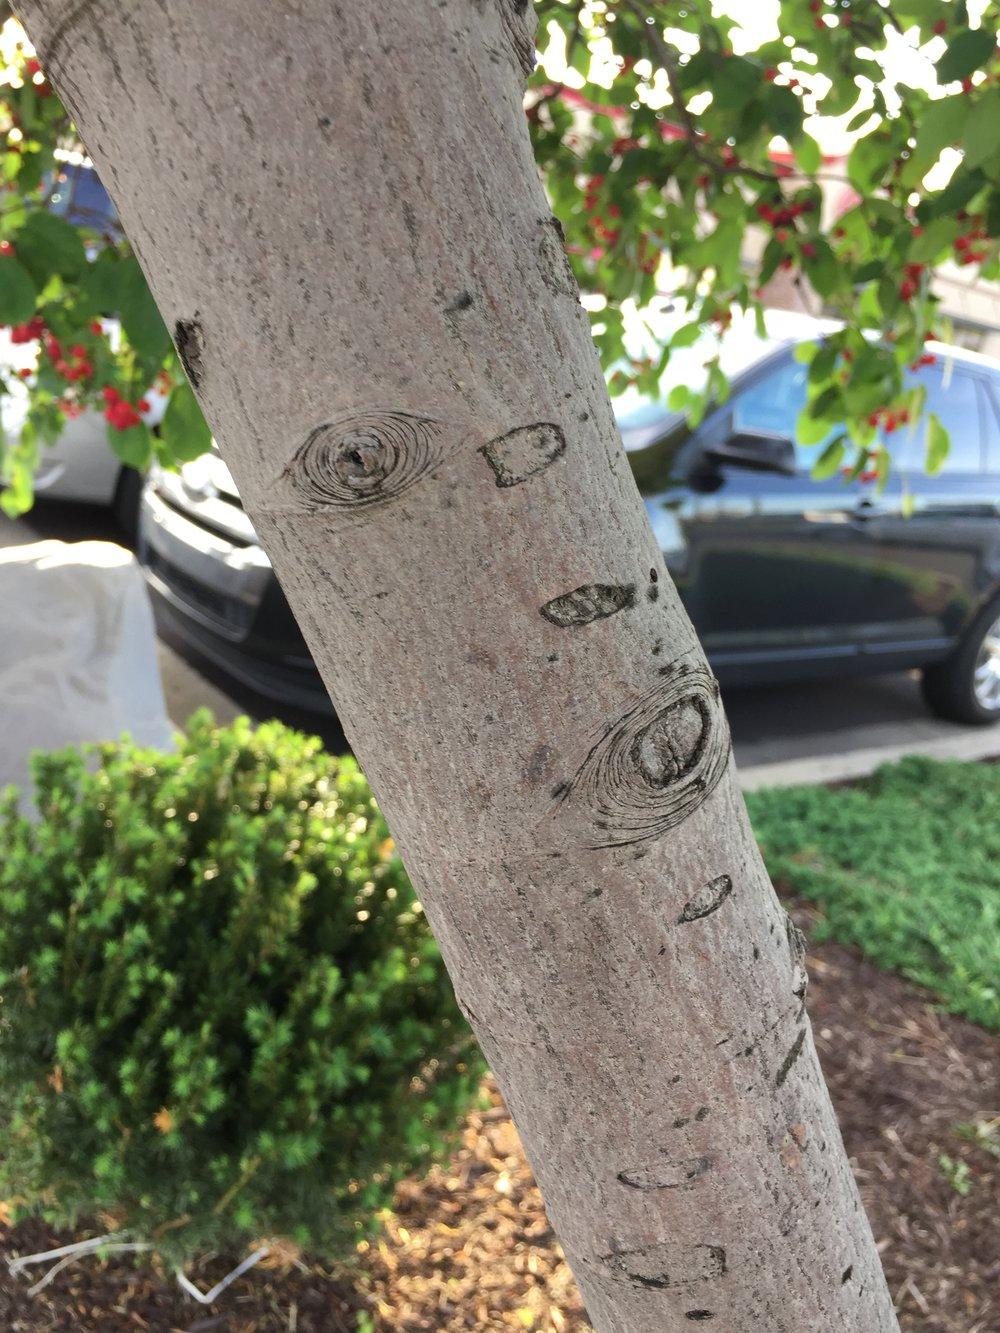 The smooth gray bark of an ornamental serviceberry bush.